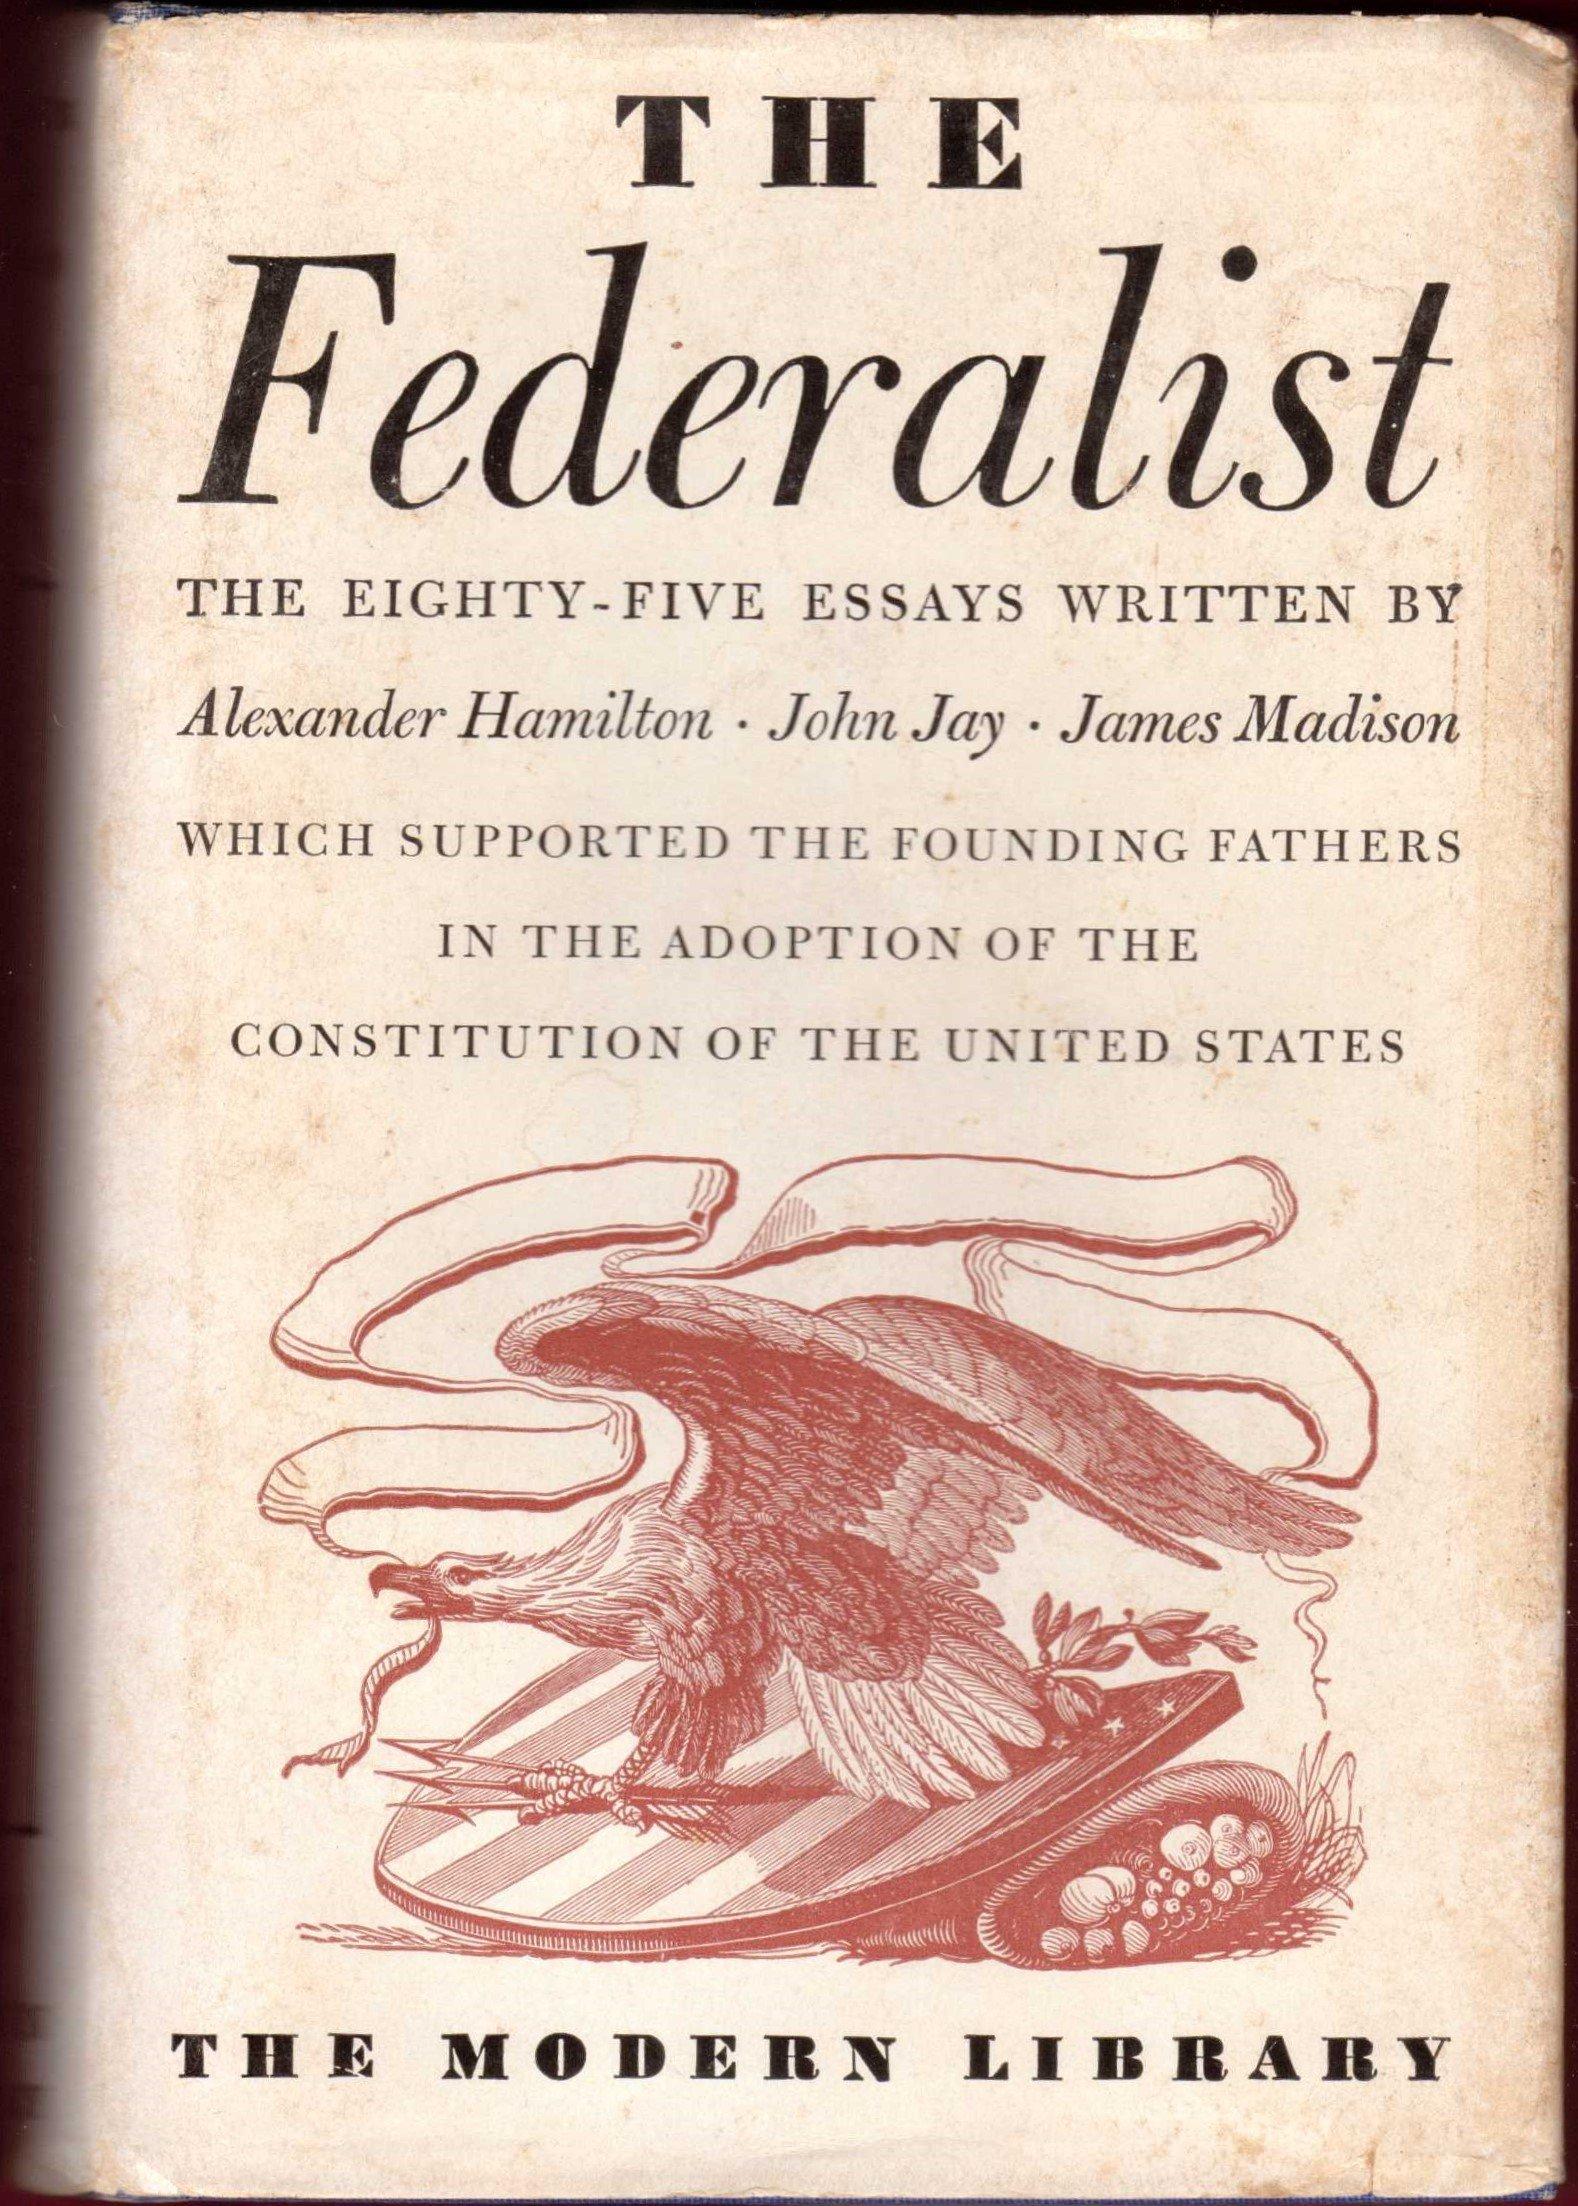 012 Alexander Hamilton Essays 91n4zdfy2el Essay Frightening Federalist Papers Summary 51 Full